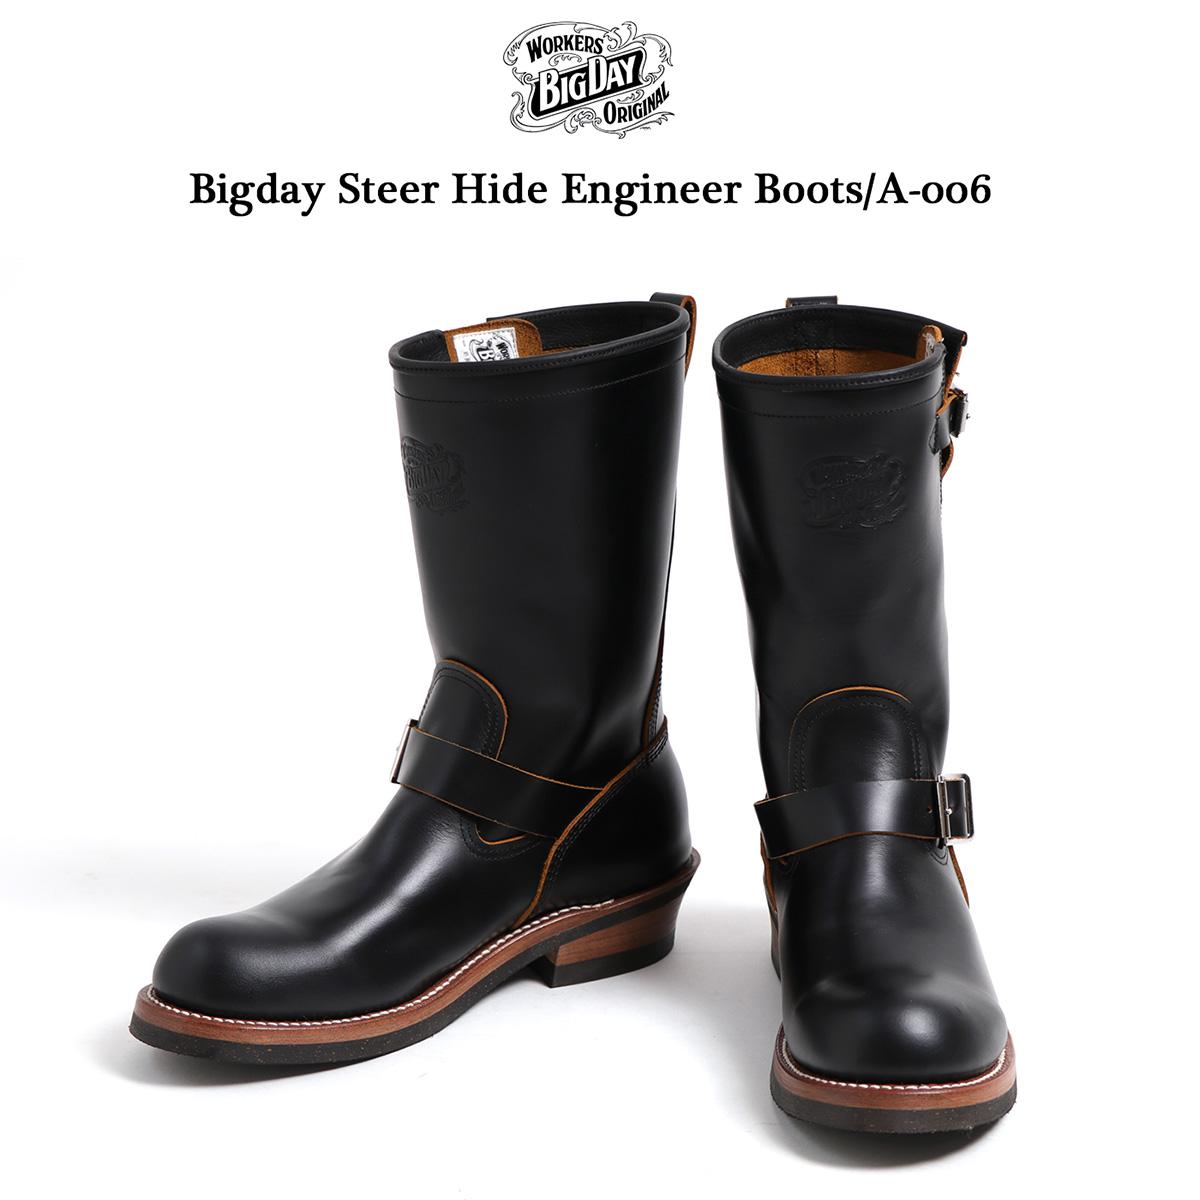 BIGDAY ビッグデイ ブーツ 牛革 本革 メンズ ステアハイドエンジニアブーツ ブラック 黒 日本製 #A-006